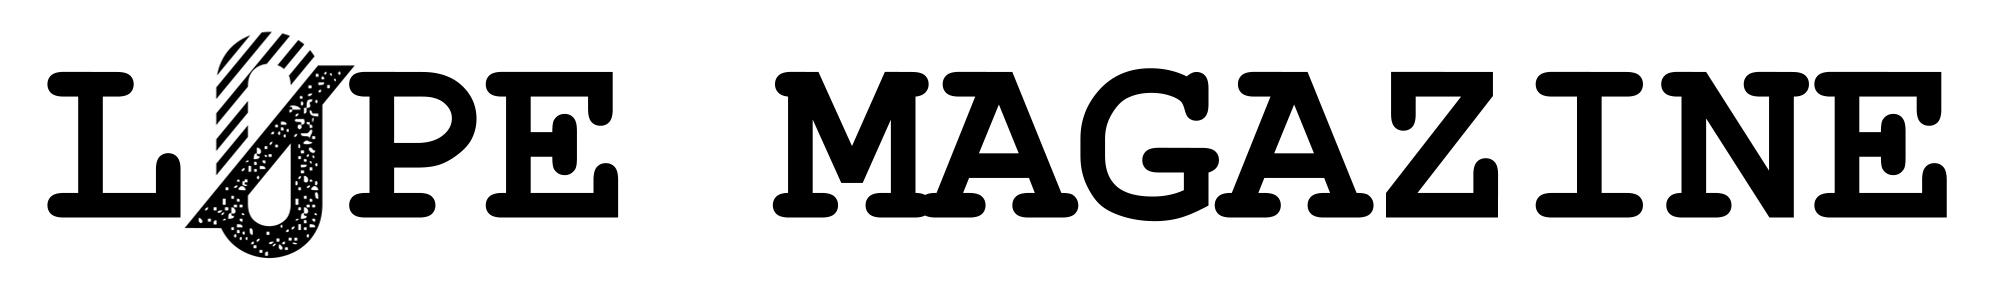 LØPE Magazine